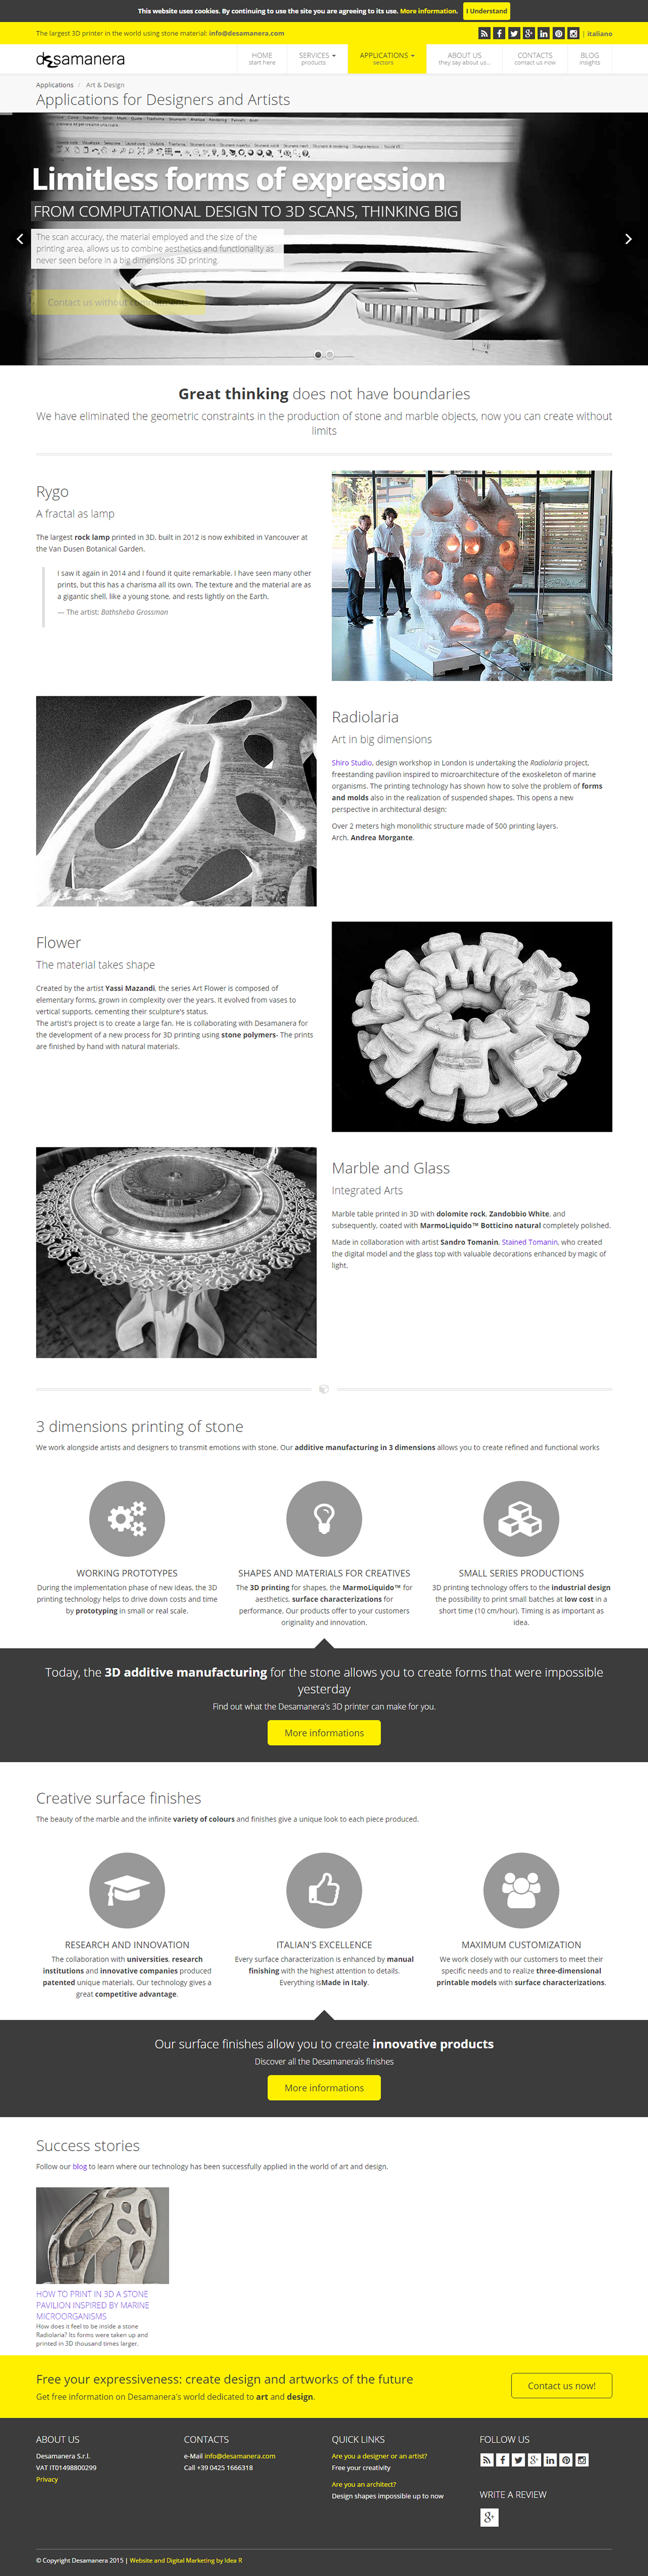 3D Printer Startup social media Bolg Responsive web design html5 Asp.Net